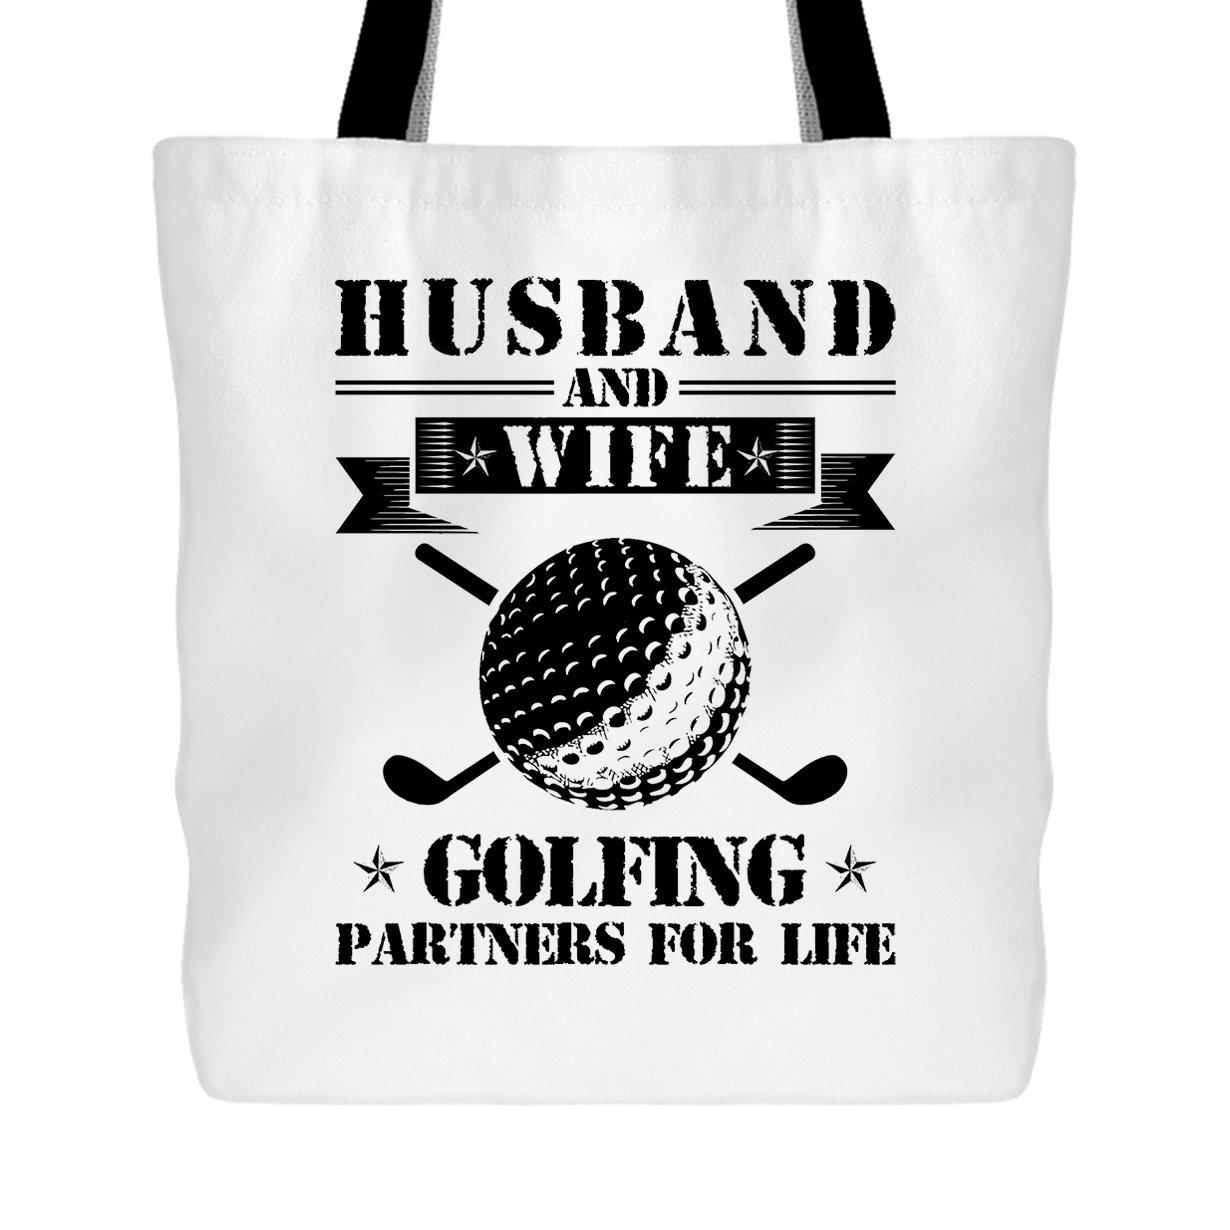 Amazon.com: Golfing Tote Bag - Husband And Wife Golfing Handbags Design (White Tote Bag): Shoes